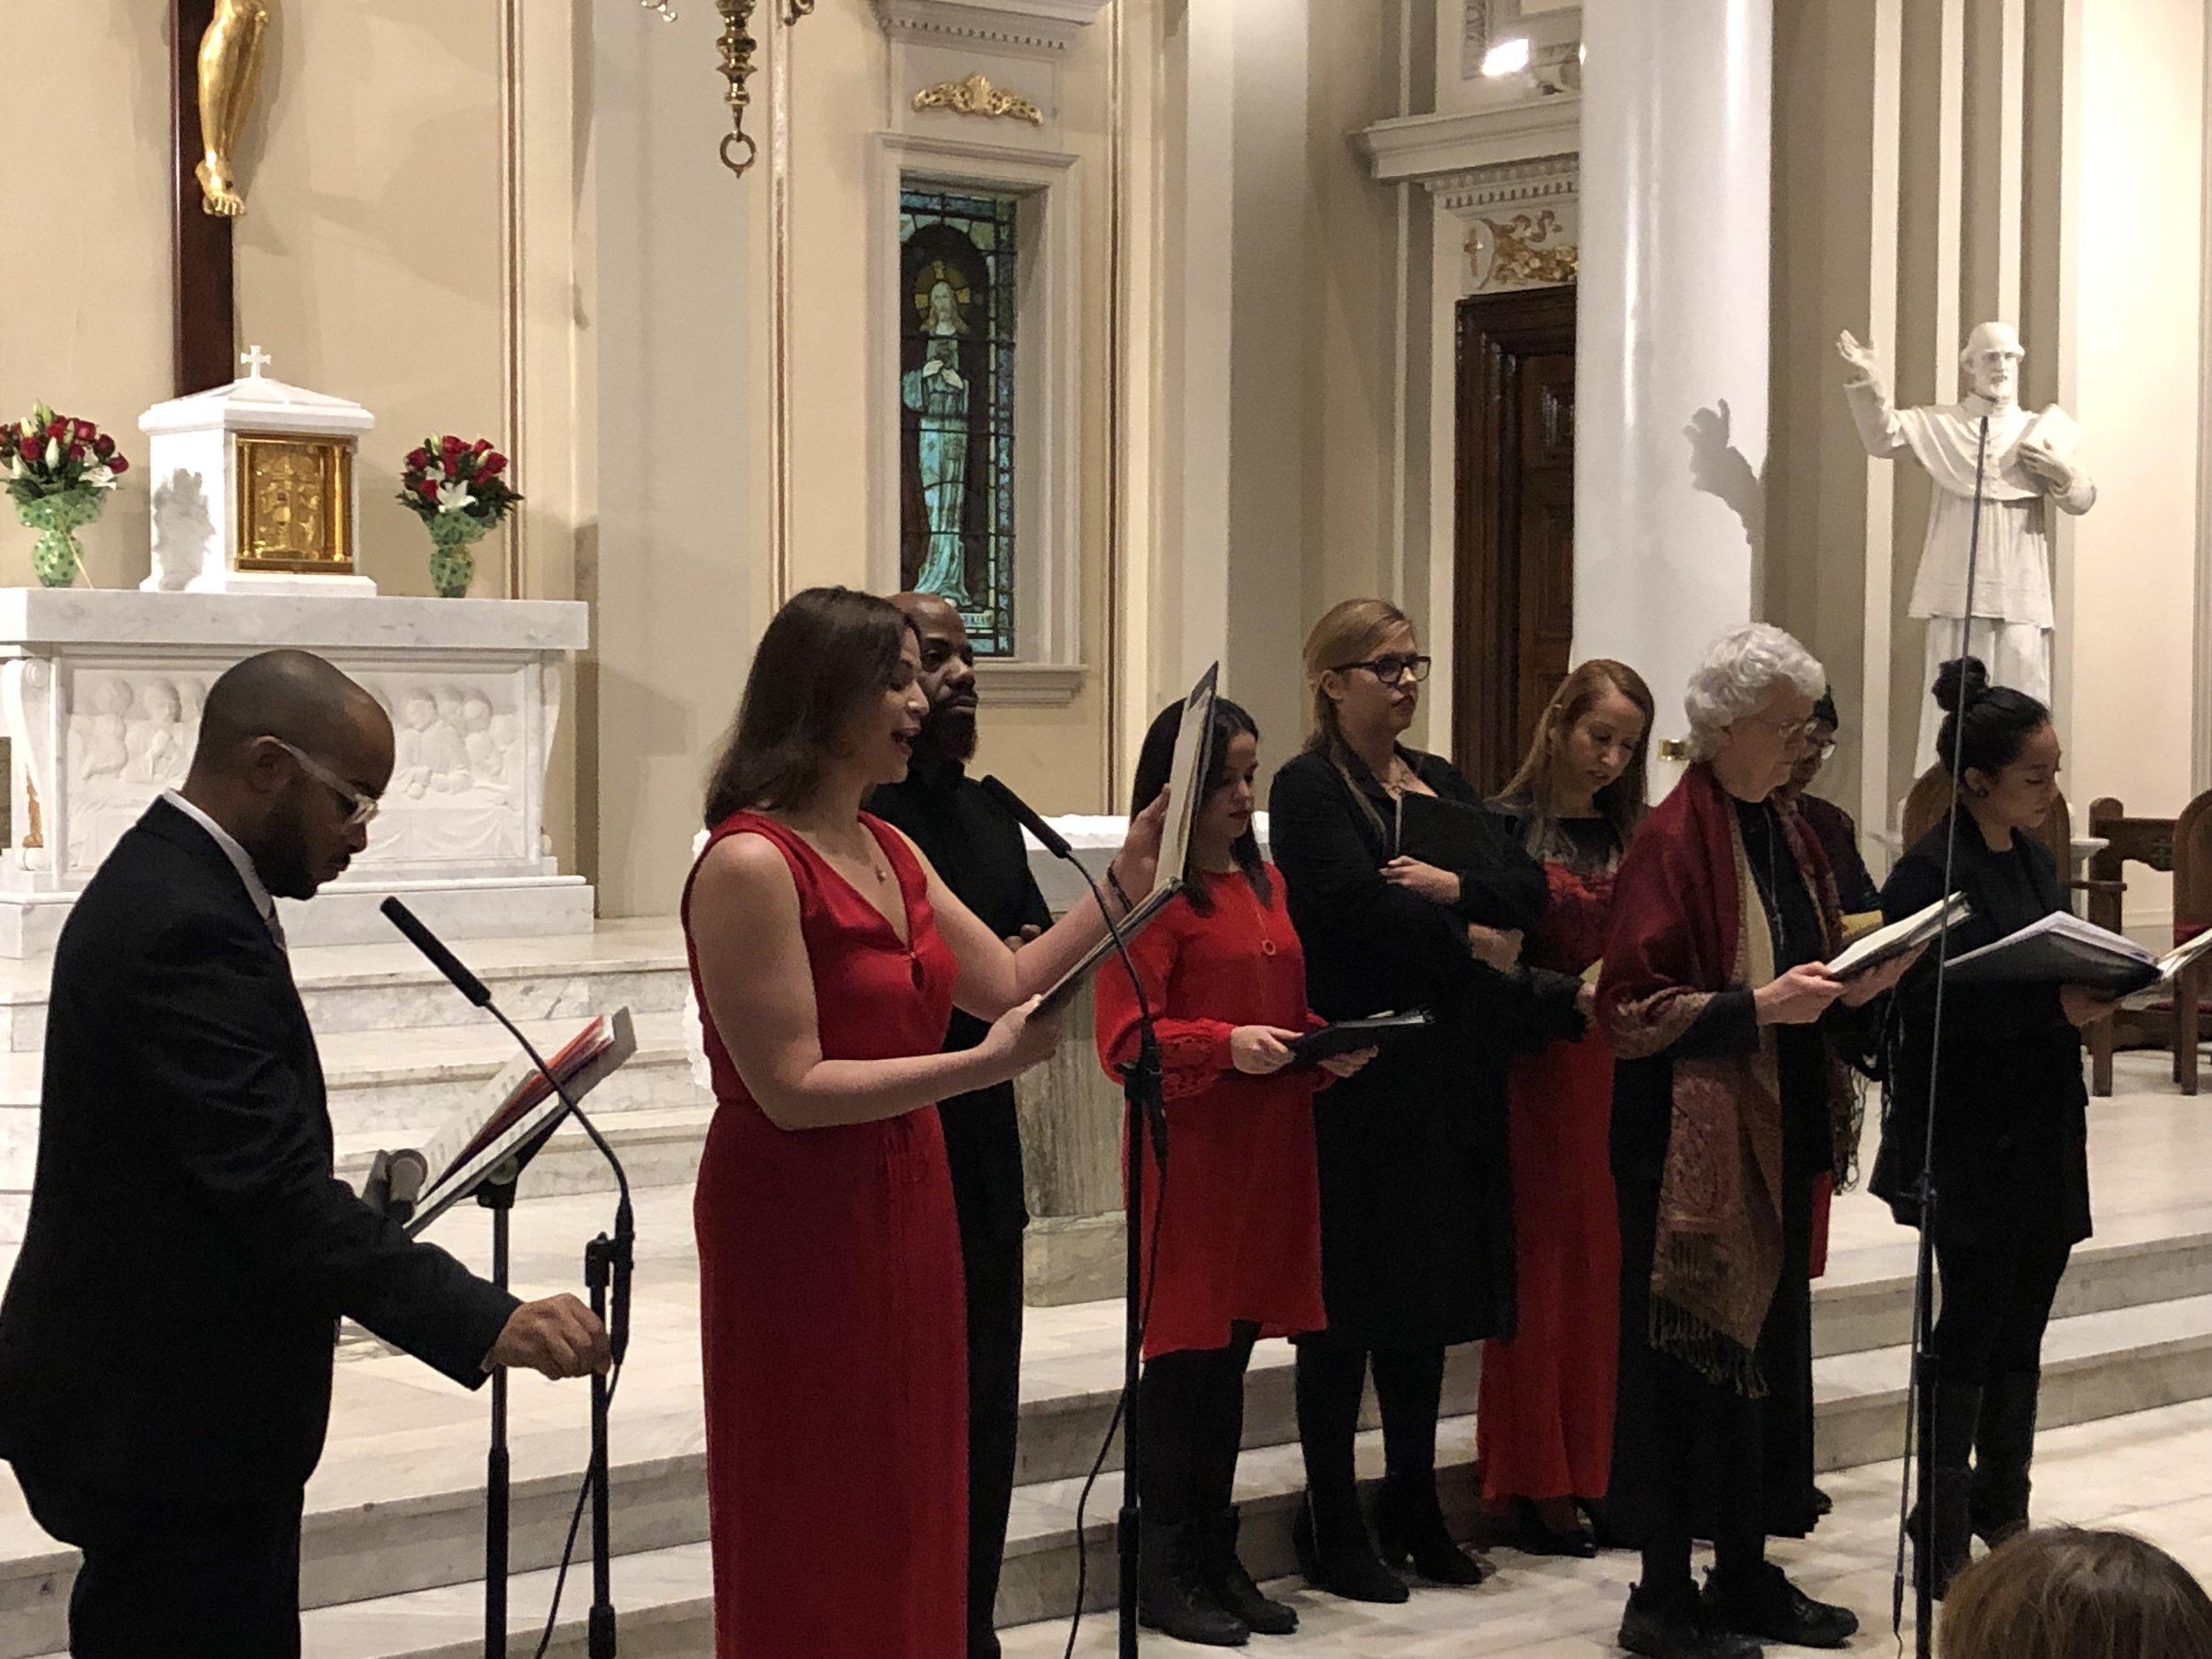 IMG_2315-mark-howell-singers-saint-francis-de-sales-church-sing-joy-adult-choir-gospel-new-york-city.jpg